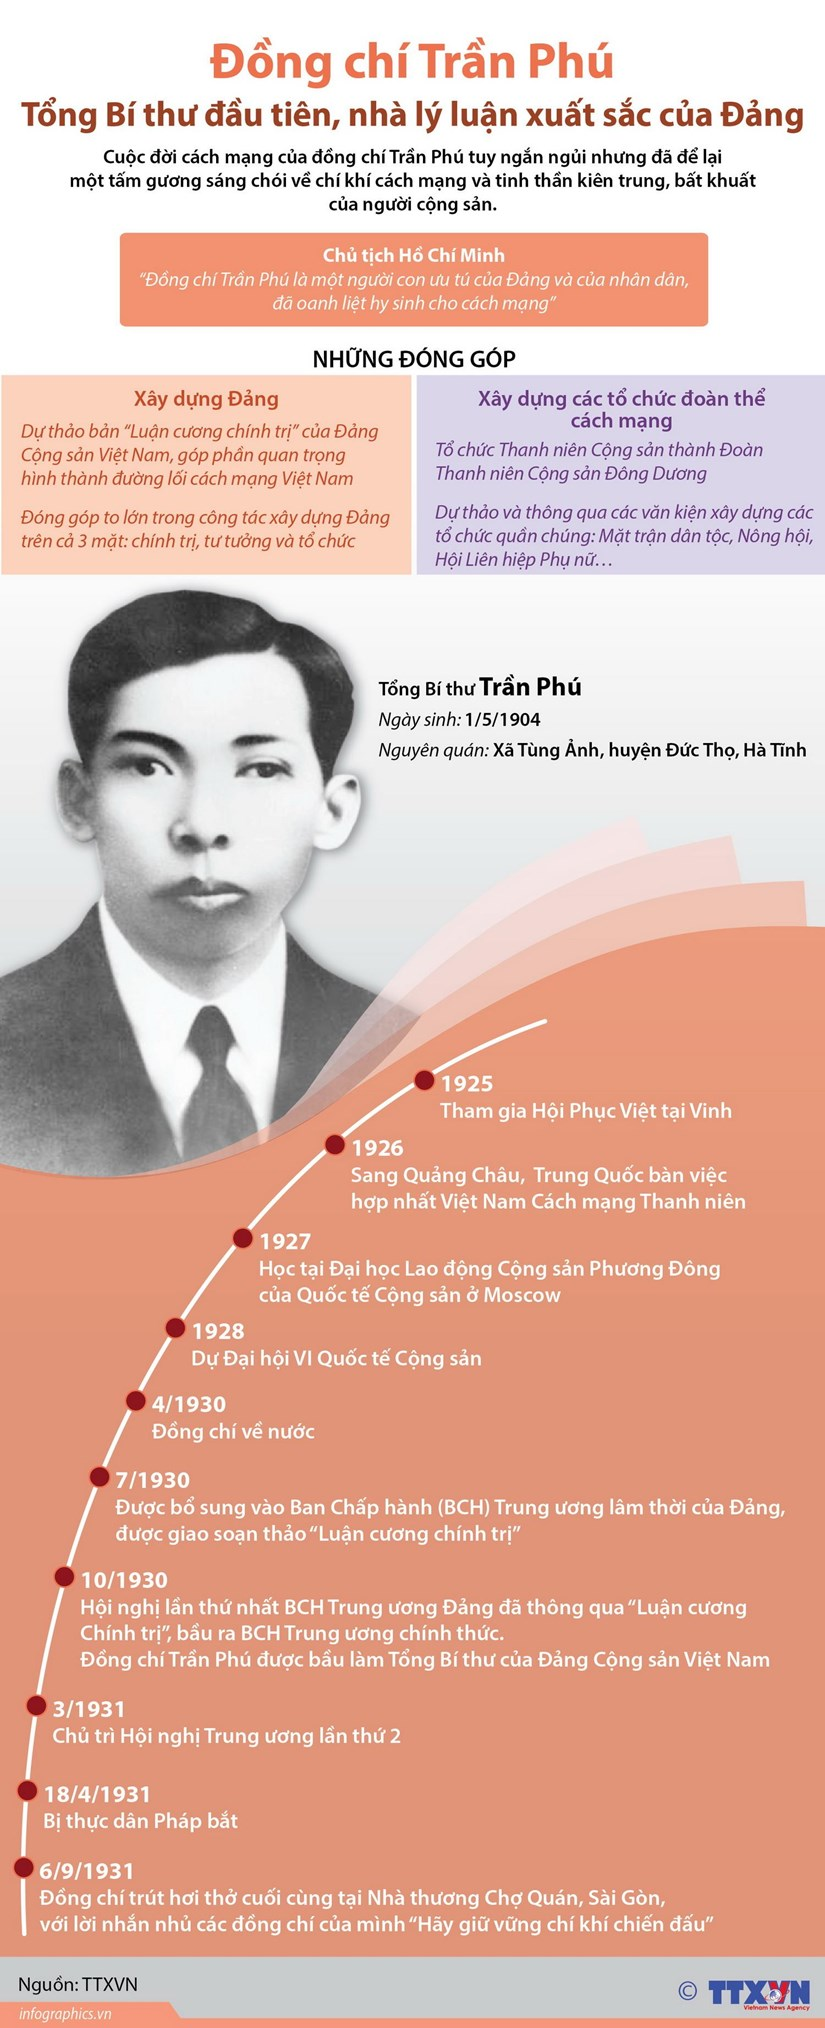 Tran Phu - Tong Bi thu dau tien, nha ly luan xuat sac cua Dang hinh anh 1